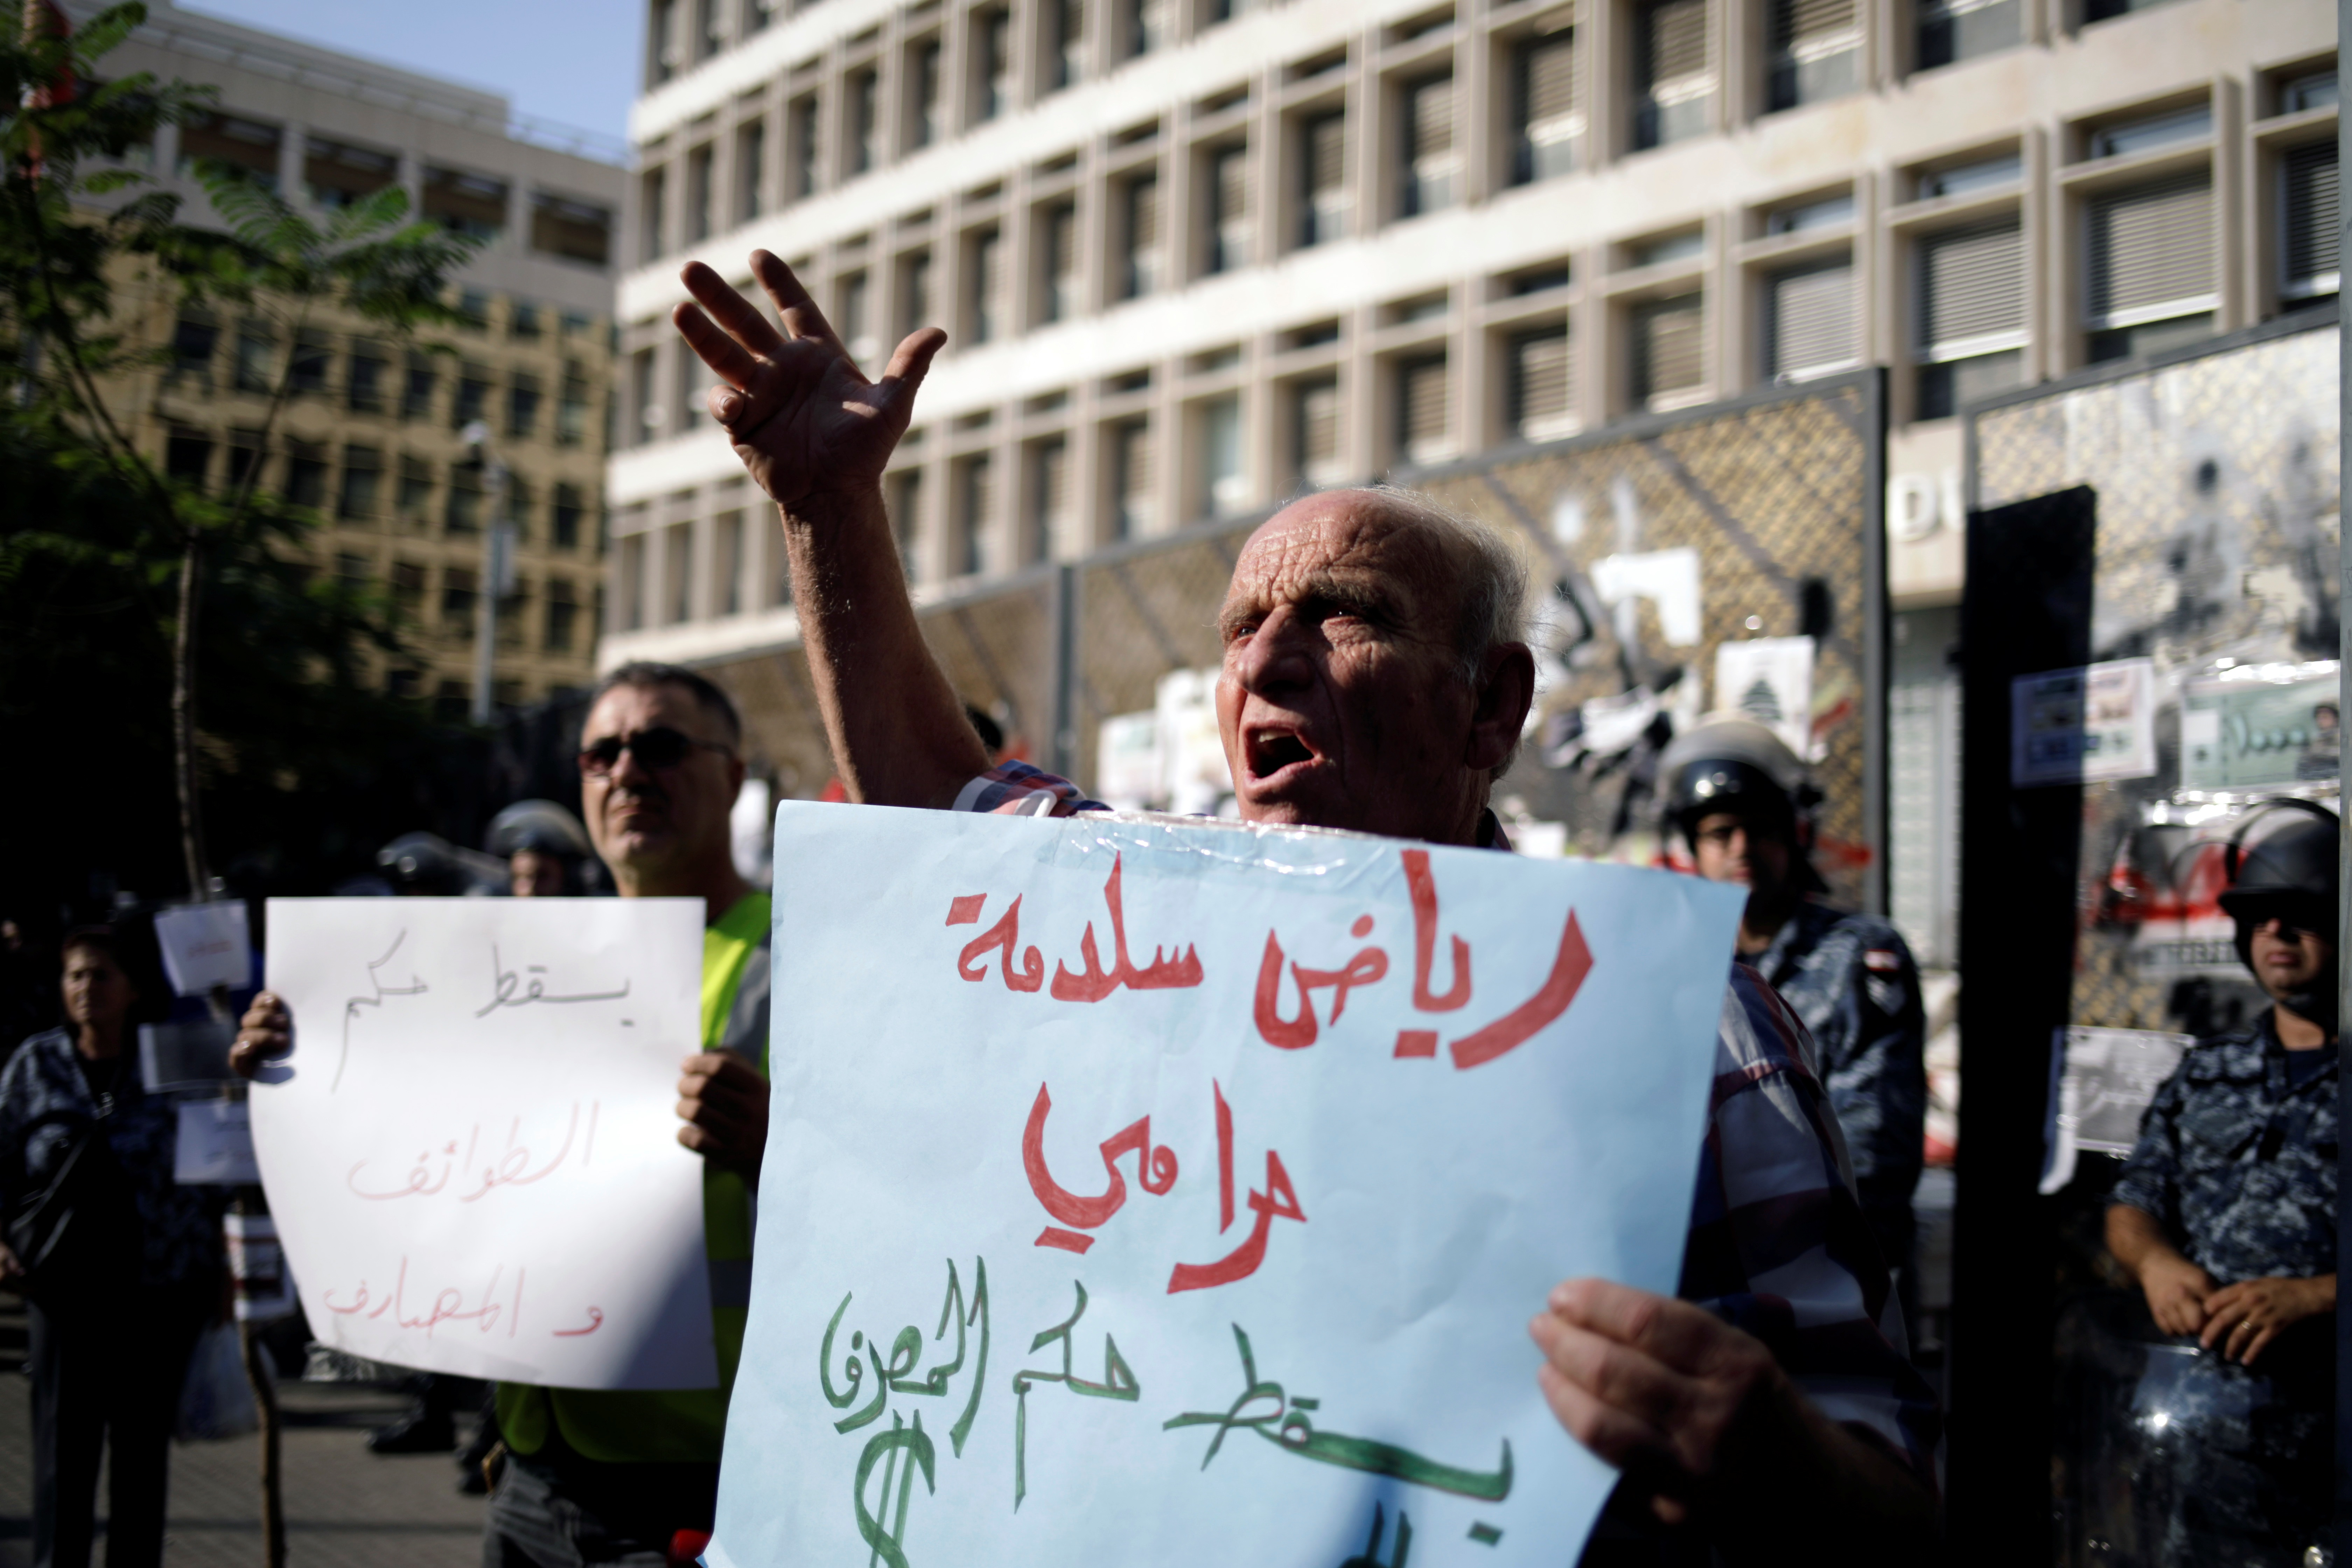 لبناني يرفع لافتة تنعت حاكم مصرف لبنان باللص.